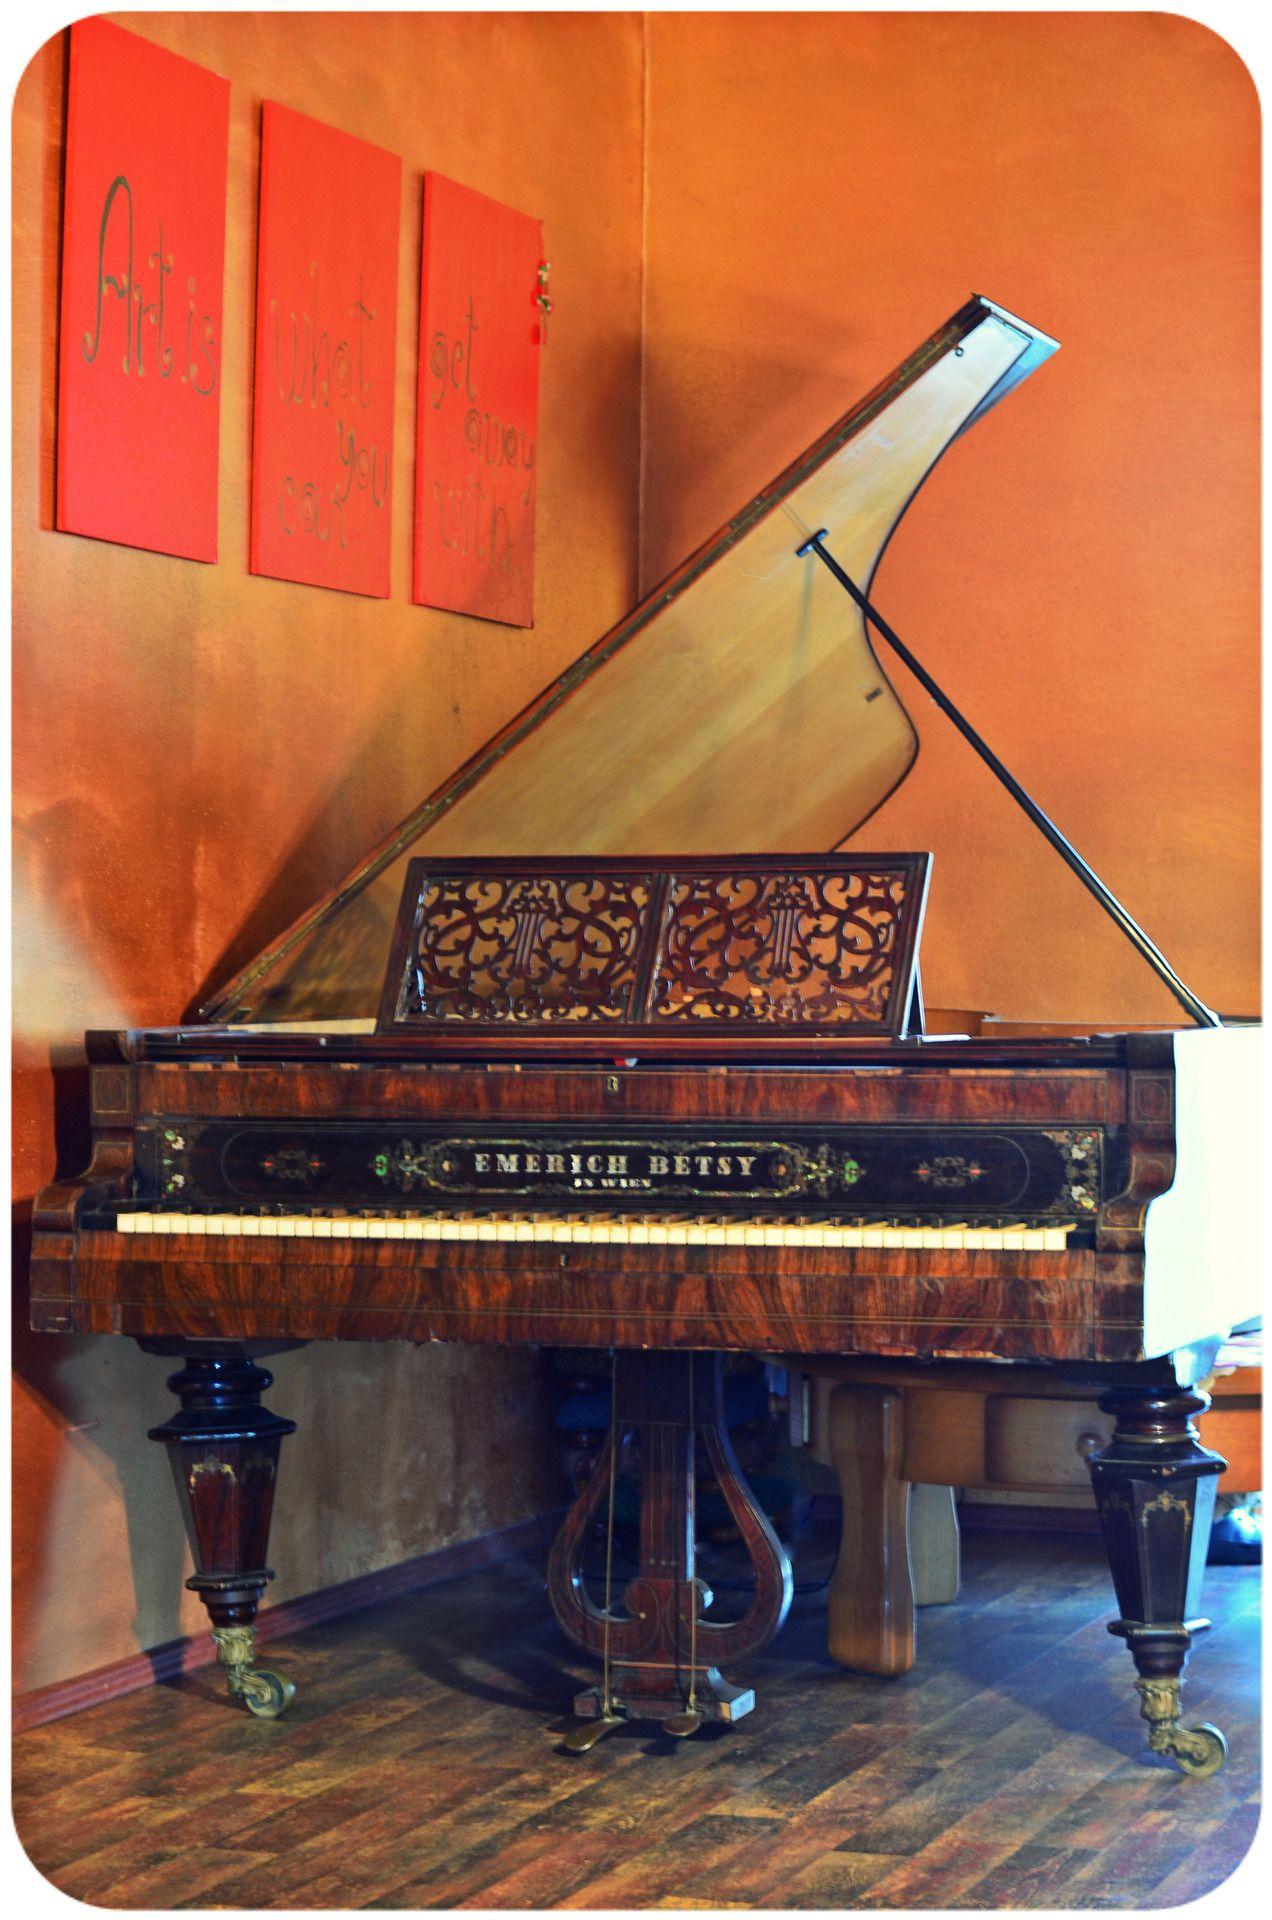 Emerich Betsy Piano {For Sale}, antique piano